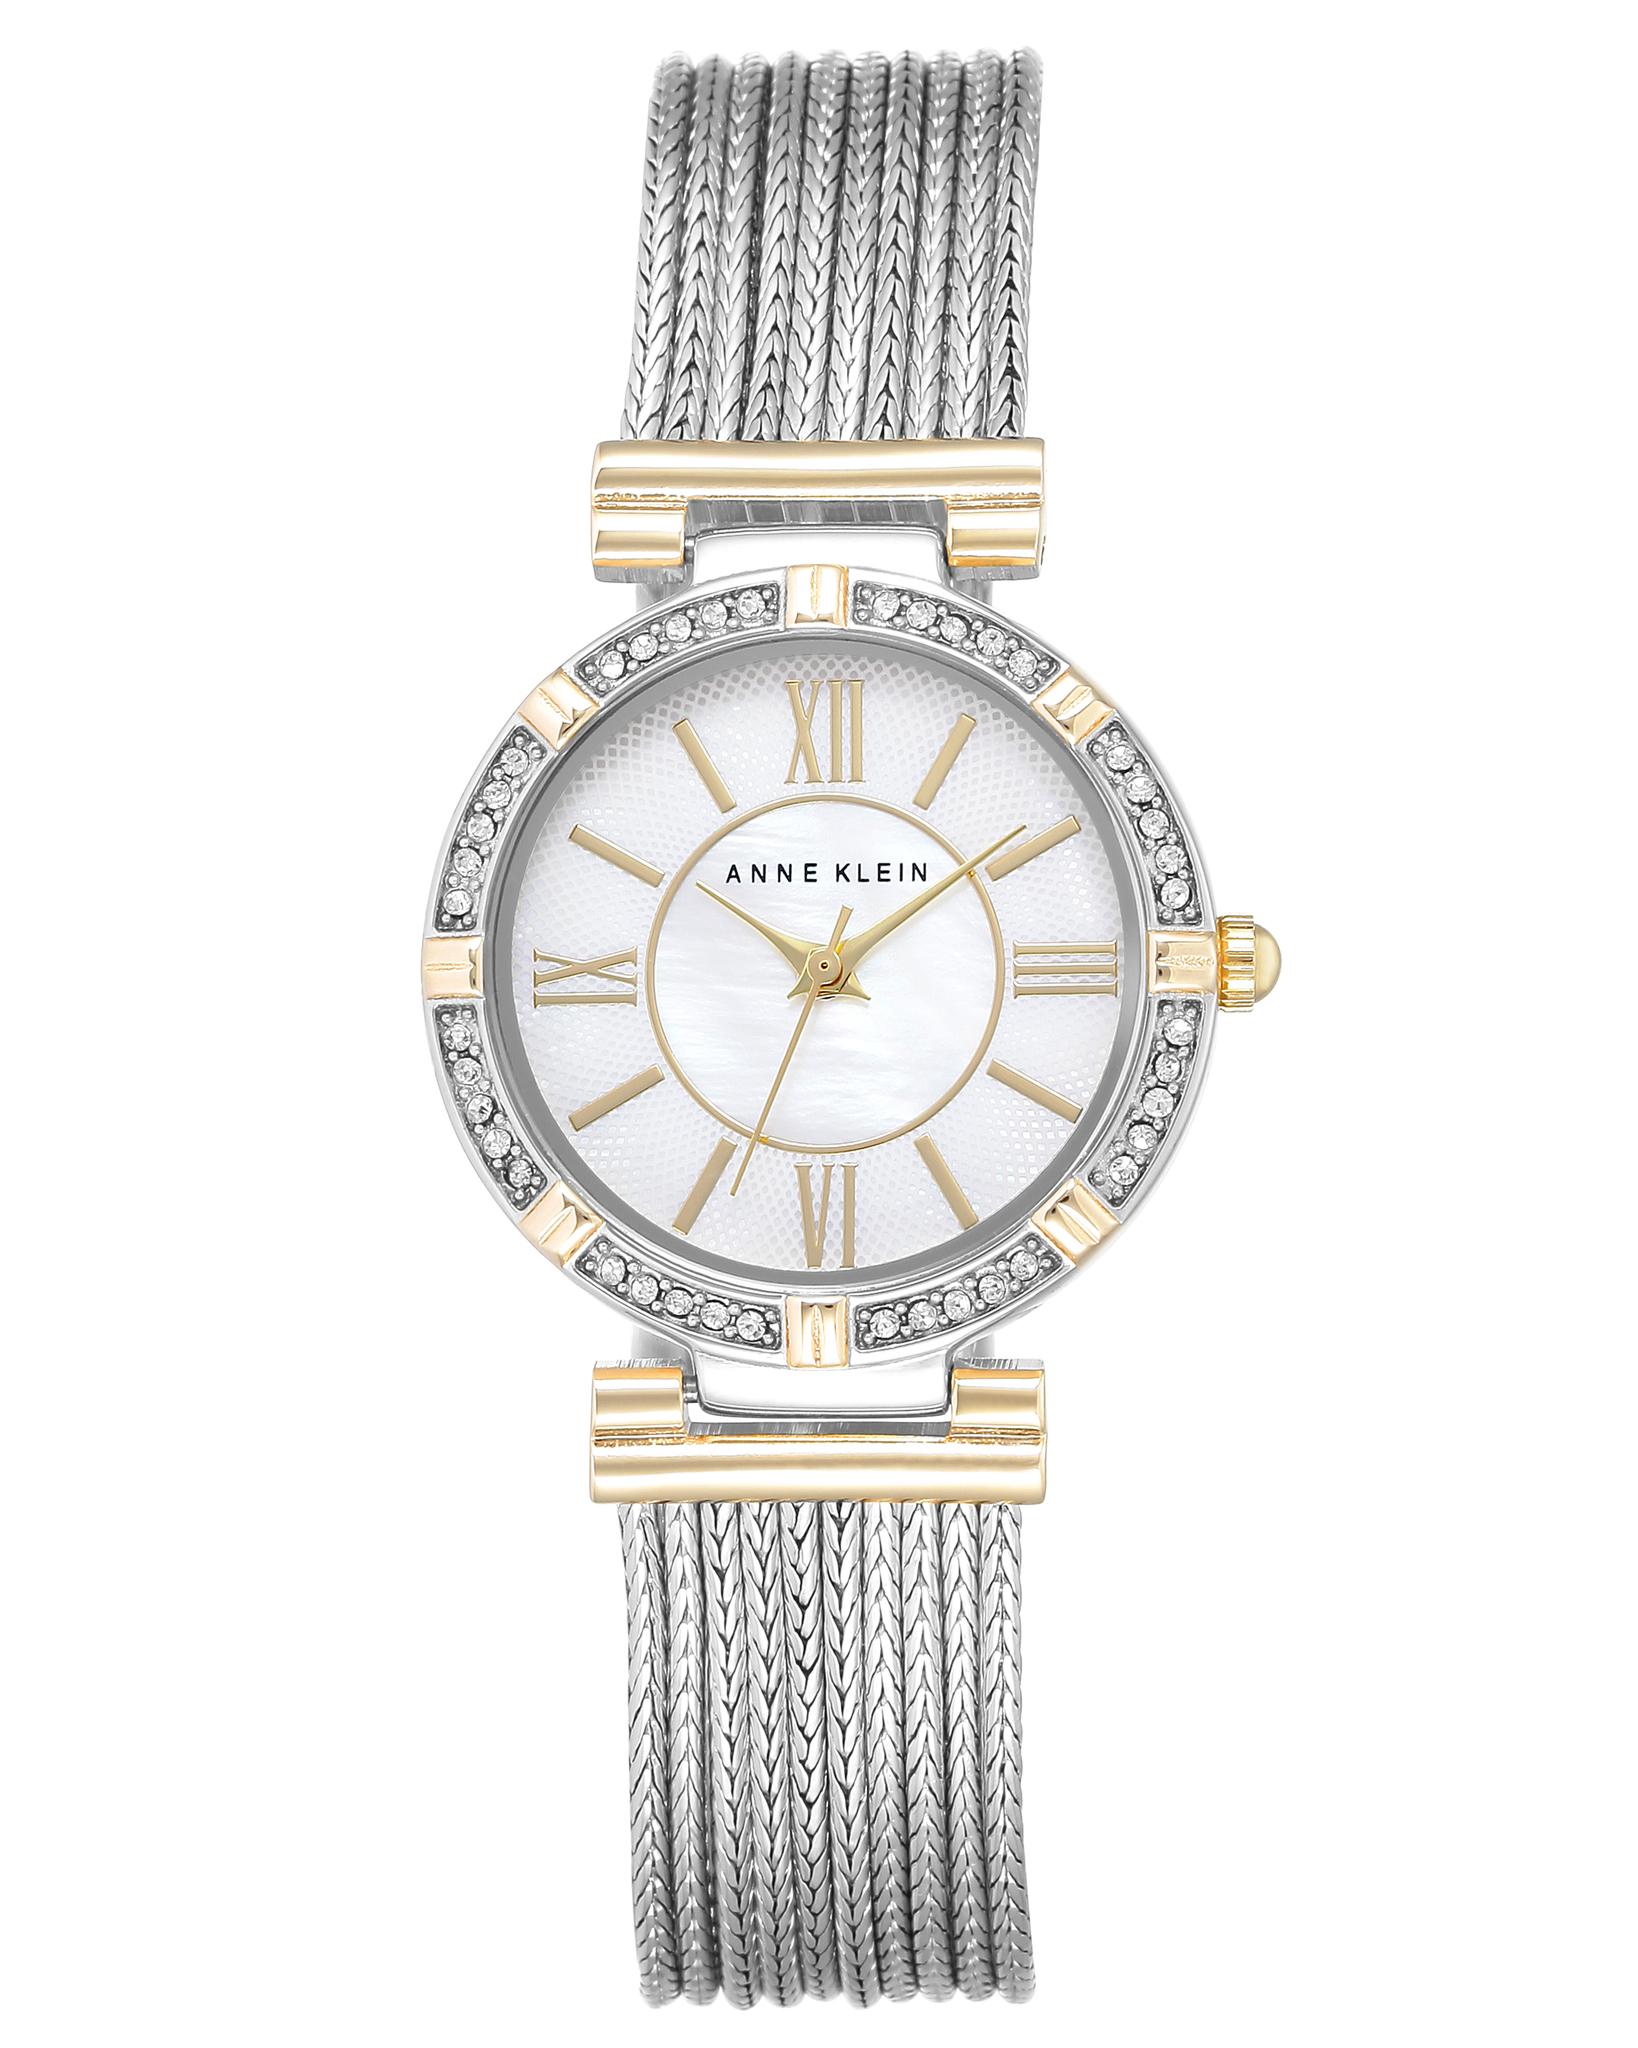 Anne Klein 2145MPTT - женские наручные часы из коллекции RINGAnne Klein<br><br><br>Бренд: Anne Klein<br>Модель: Anne Klein 2145 MPTT<br>Артикул: 2145MPTT<br>Вариант артикула: None<br>Коллекция: RING<br>Подколлекция: None<br>Страна: США<br>Пол: женские<br>Тип механизма: кварцевые<br>Механизм: None<br>Количество камней: None<br>Автоподзавод: None<br>Источник энергии: от батарейки<br>Срок службы элемента питания: None<br>Дисплей: стрелки<br>Цифры: римские<br>Водозащита: WR 30<br>Противоударные: None<br>Материал корпуса: не указан, PVD покрытие (частичное)<br>Материал браслета: не указан, PVD покрытие (частичное)<br>Материал безеля: None<br>Стекло: минеральное<br>Антибликовое покрытие: None<br>Цвет корпуса: None<br>Цвет браслета: None<br>Цвет циферблата: None<br>Цвет безеля: None<br>Размеры: 28 мм<br>Диаметр: None<br>Диаметр корпуса: None<br>Толщина: None<br>Ширина ремешка: None<br>Вес: None<br>Спорт-функции: None<br>Подсветка: None<br>Вставка: None<br>Отображение даты: None<br>Хронограф: None<br>Таймер: None<br>Термометр: None<br>Хронометр: None<br>GPS: None<br>Радиосинхронизация: None<br>Барометр: None<br>Скелетон: None<br>Дополнительная информация: None<br>Дополнительные функции: None